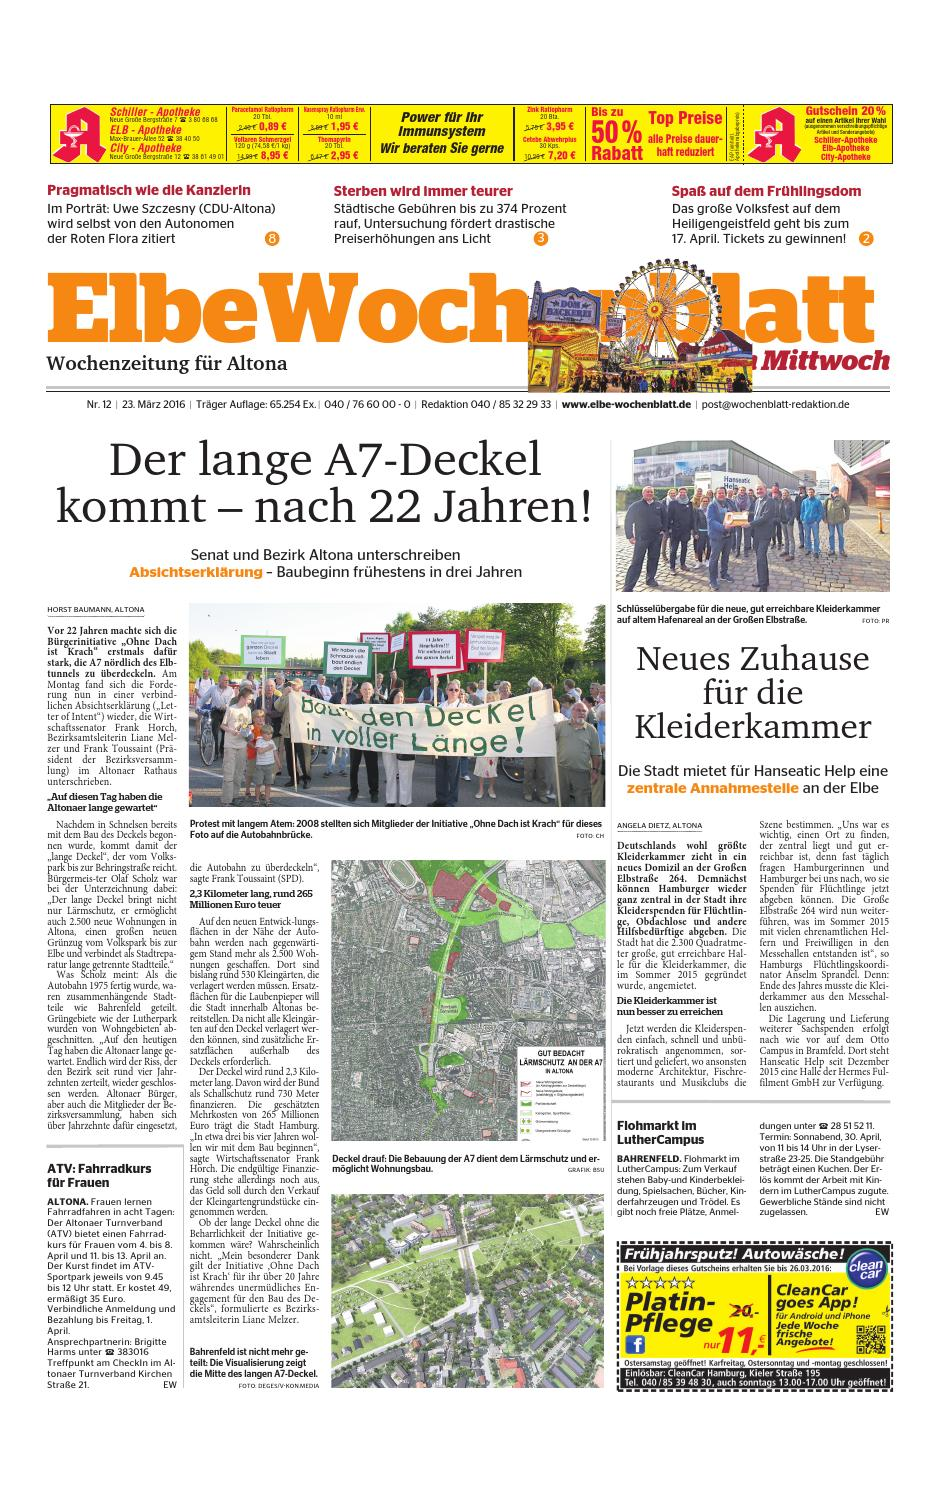 Altona KW12-2016 by Elbe Wochenblatt Verlagsgesellschaft mbH & Co.KG - issuu